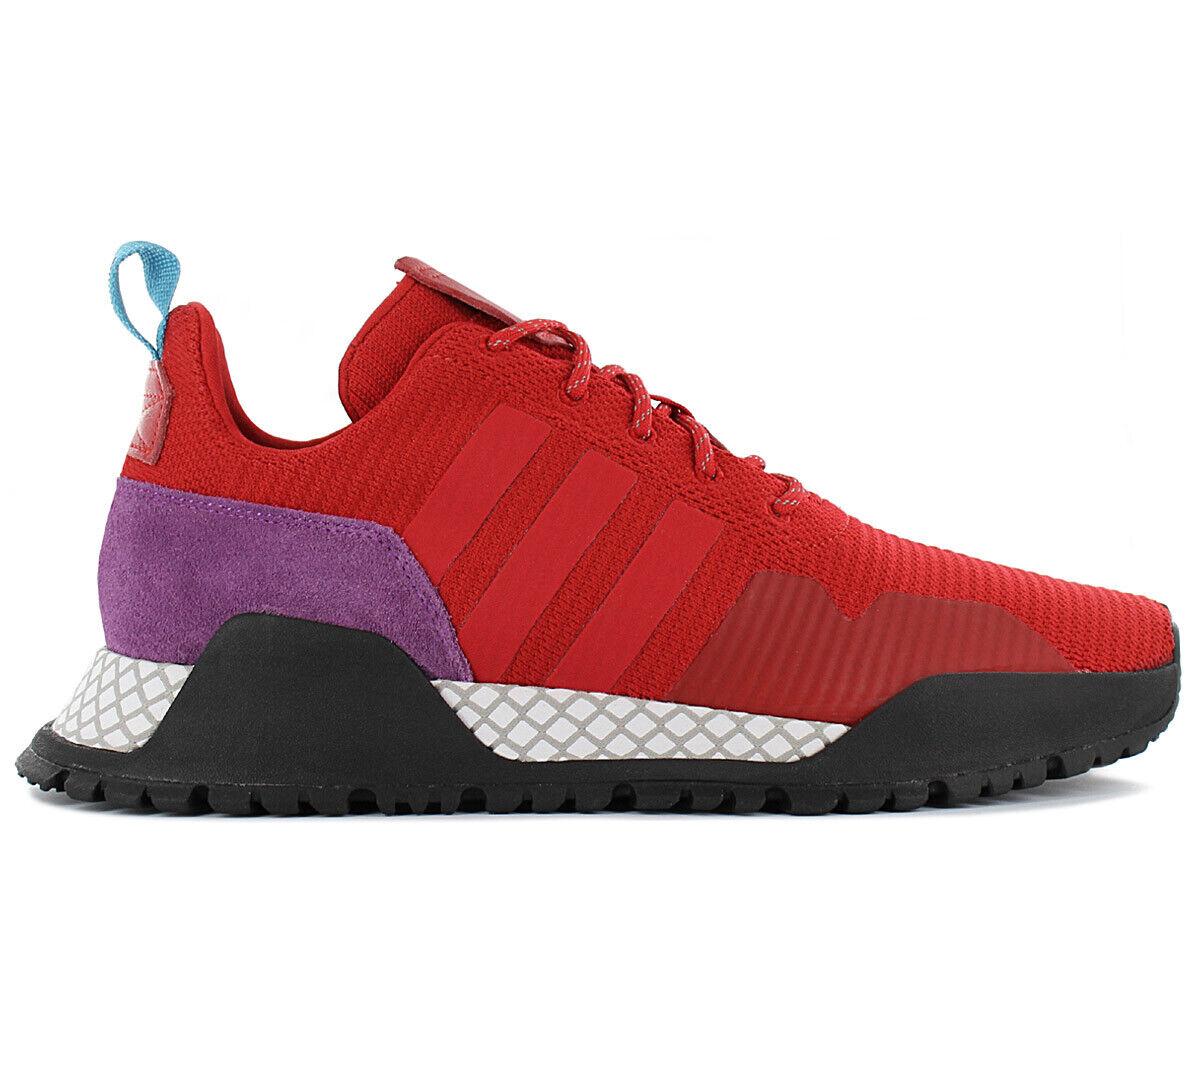 ADIDAS Originals f 1.4 PK Primeknit Scarpe scarpe da ginnastica Rosso bz0614 Scarpe Da Ginnastica Nuovo